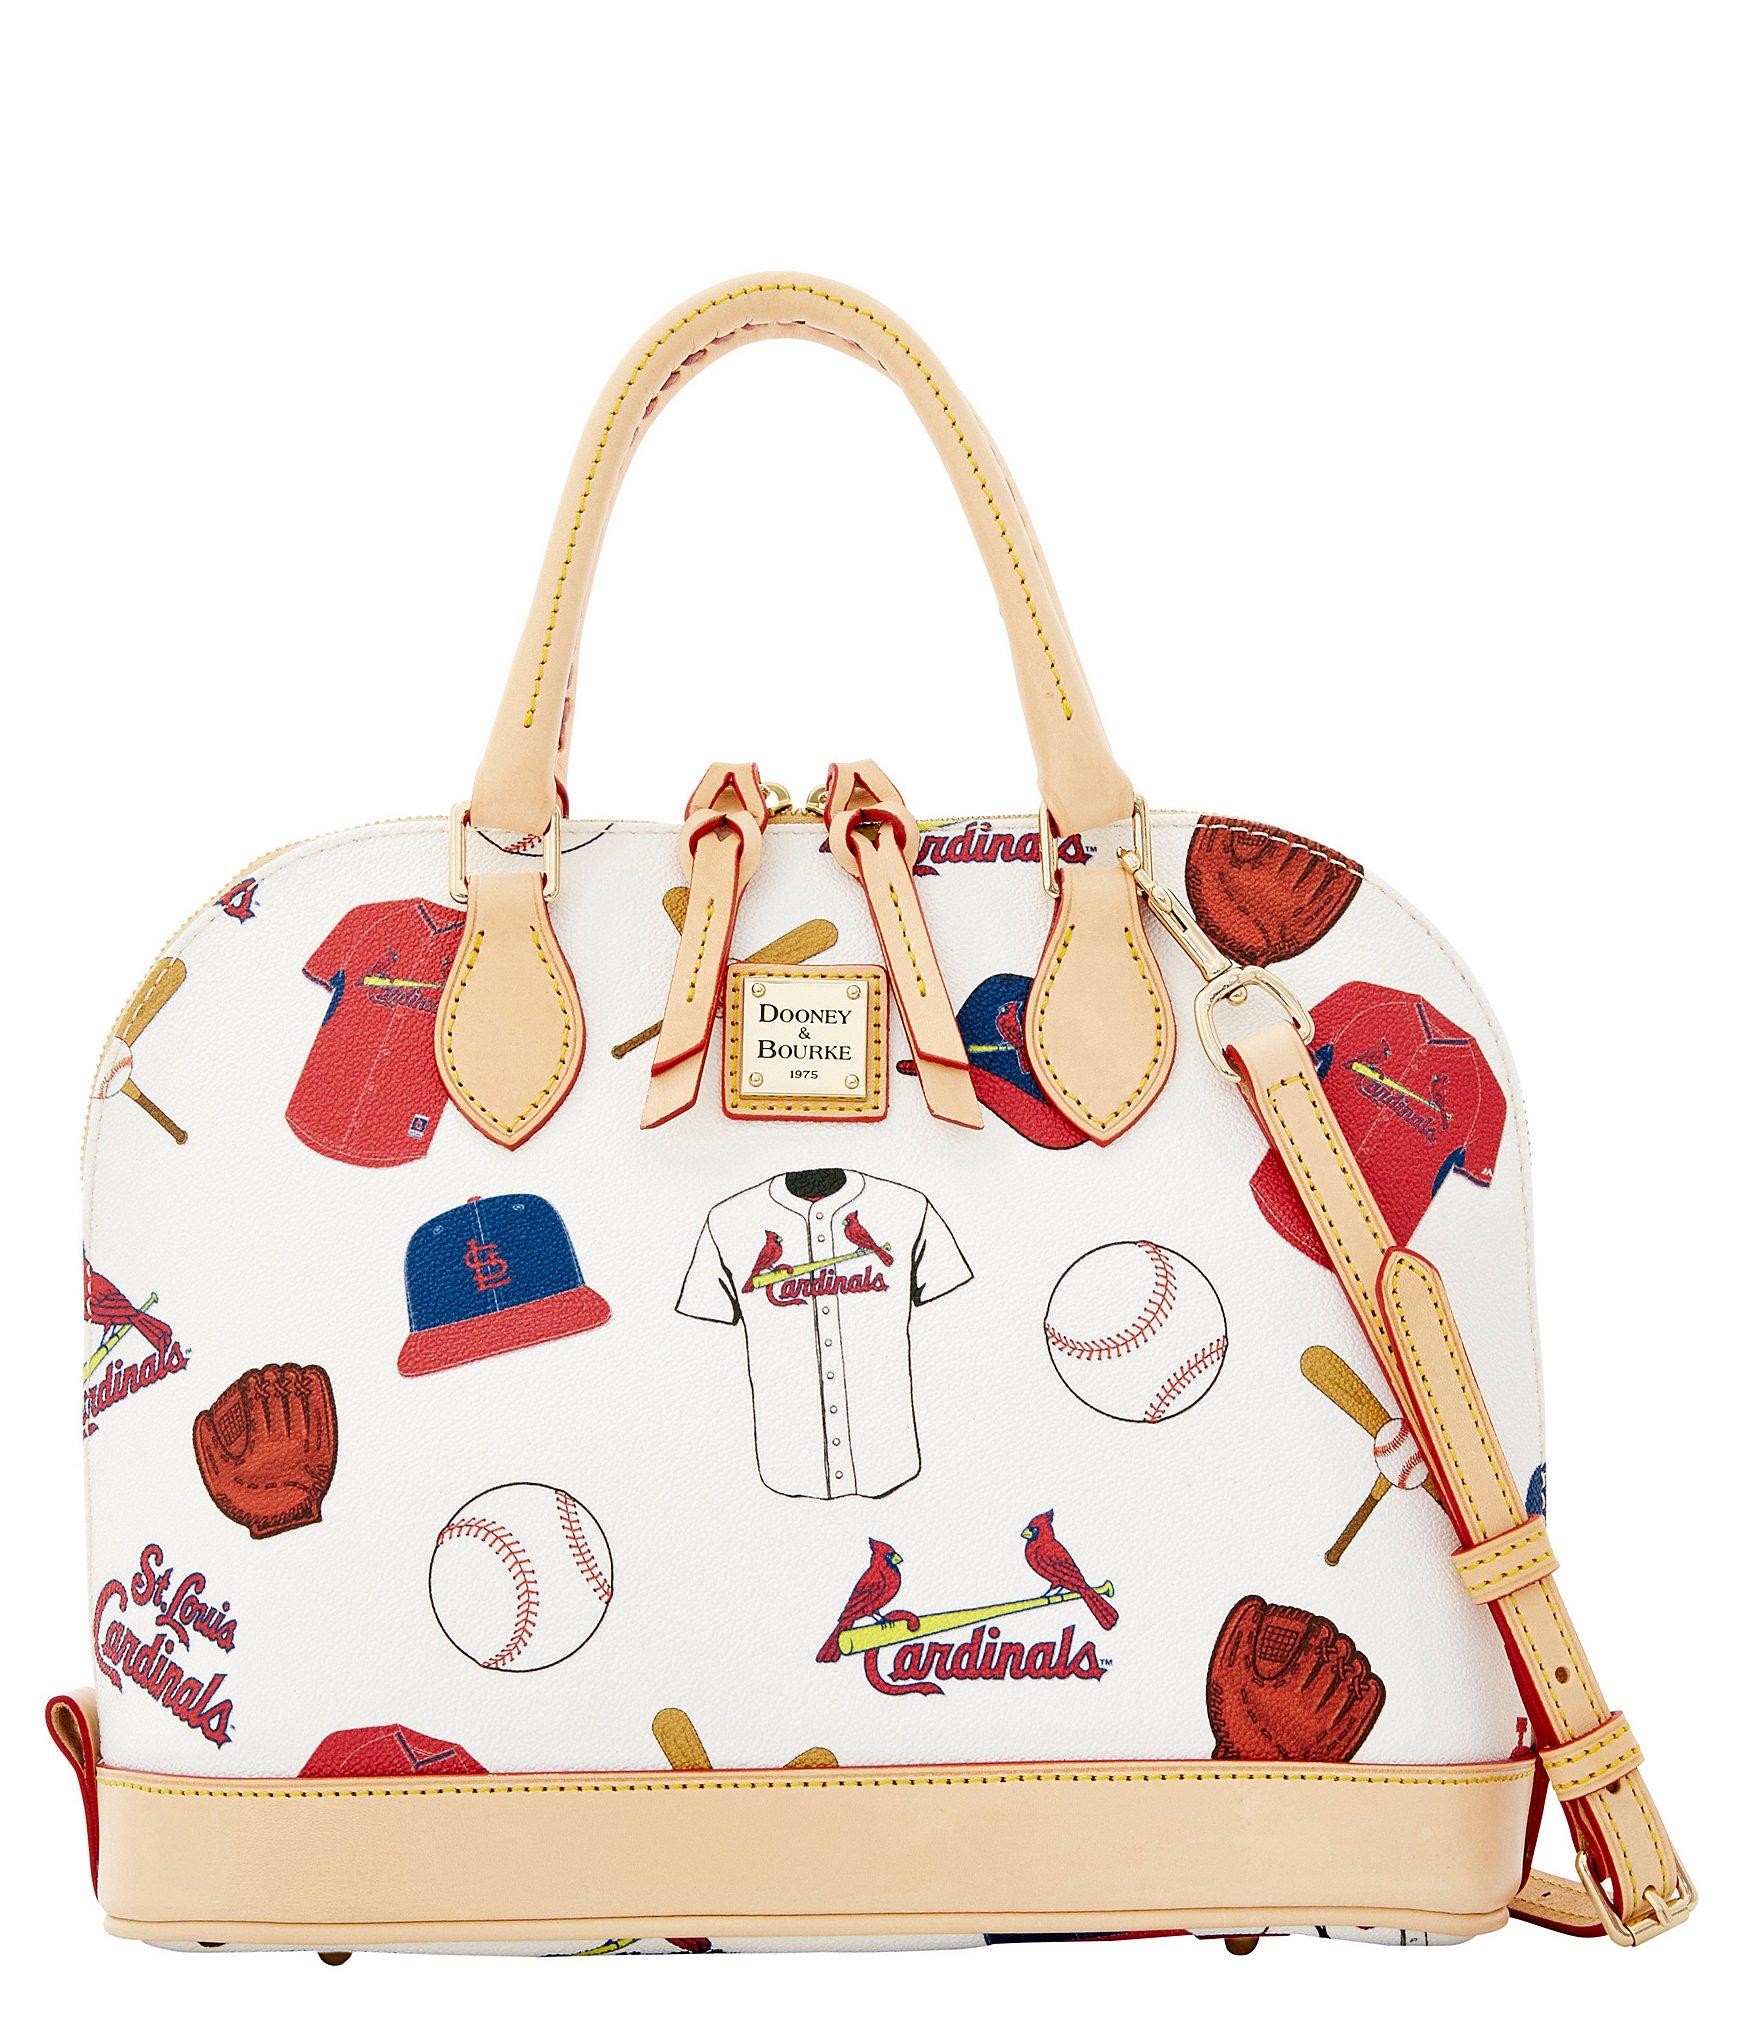 Lyst - Dooney   Bourke St. Louis Cardinals Zip Zip Satchel in White 8b6dfcfbcf